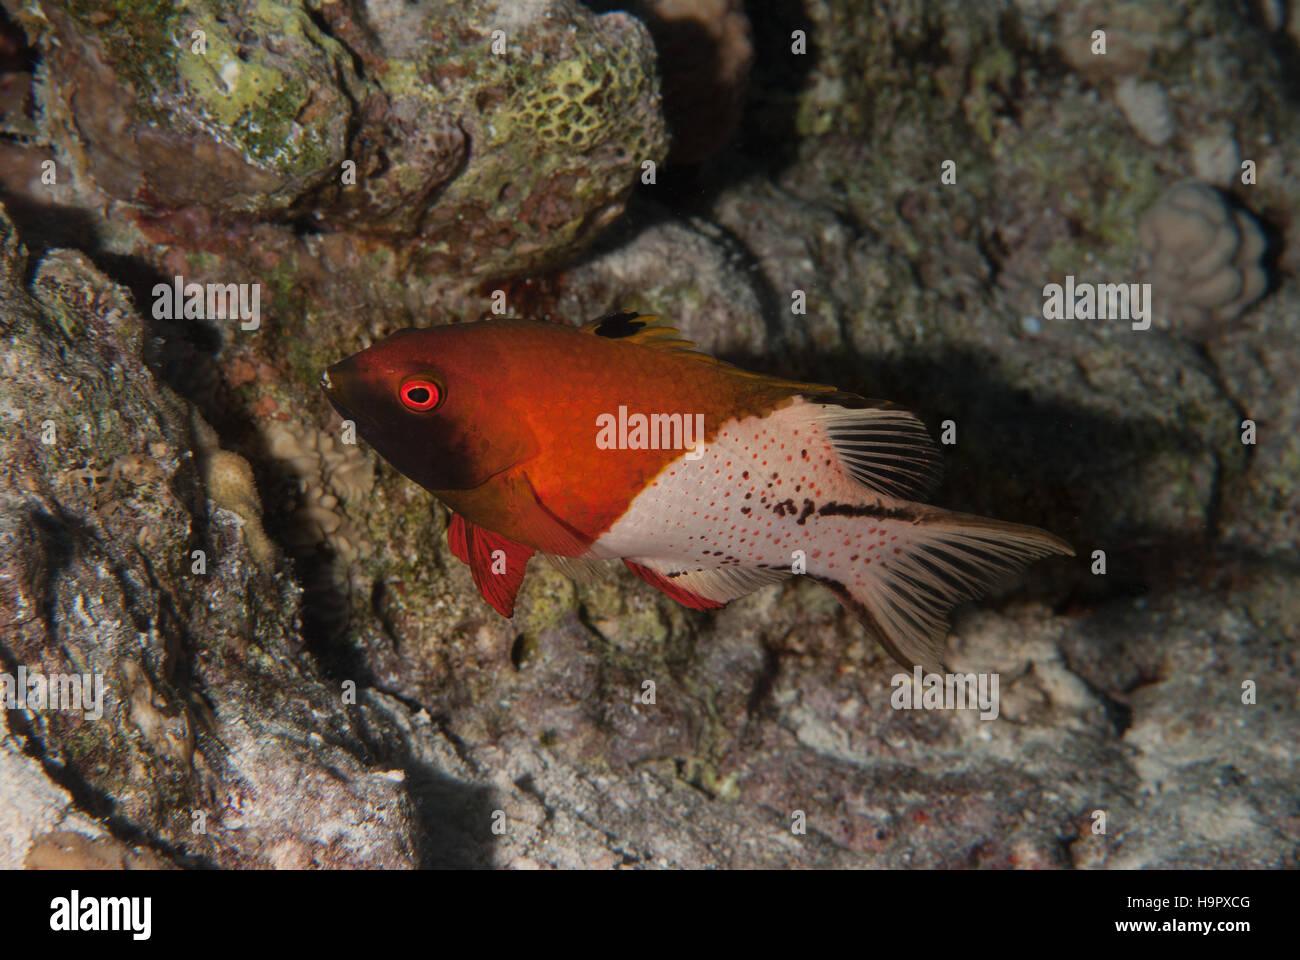 Lyretail hogfish, Bodianus anthioides, Labridae, Sharm el Sheikh, Red Sea, Egypt - Stock Image